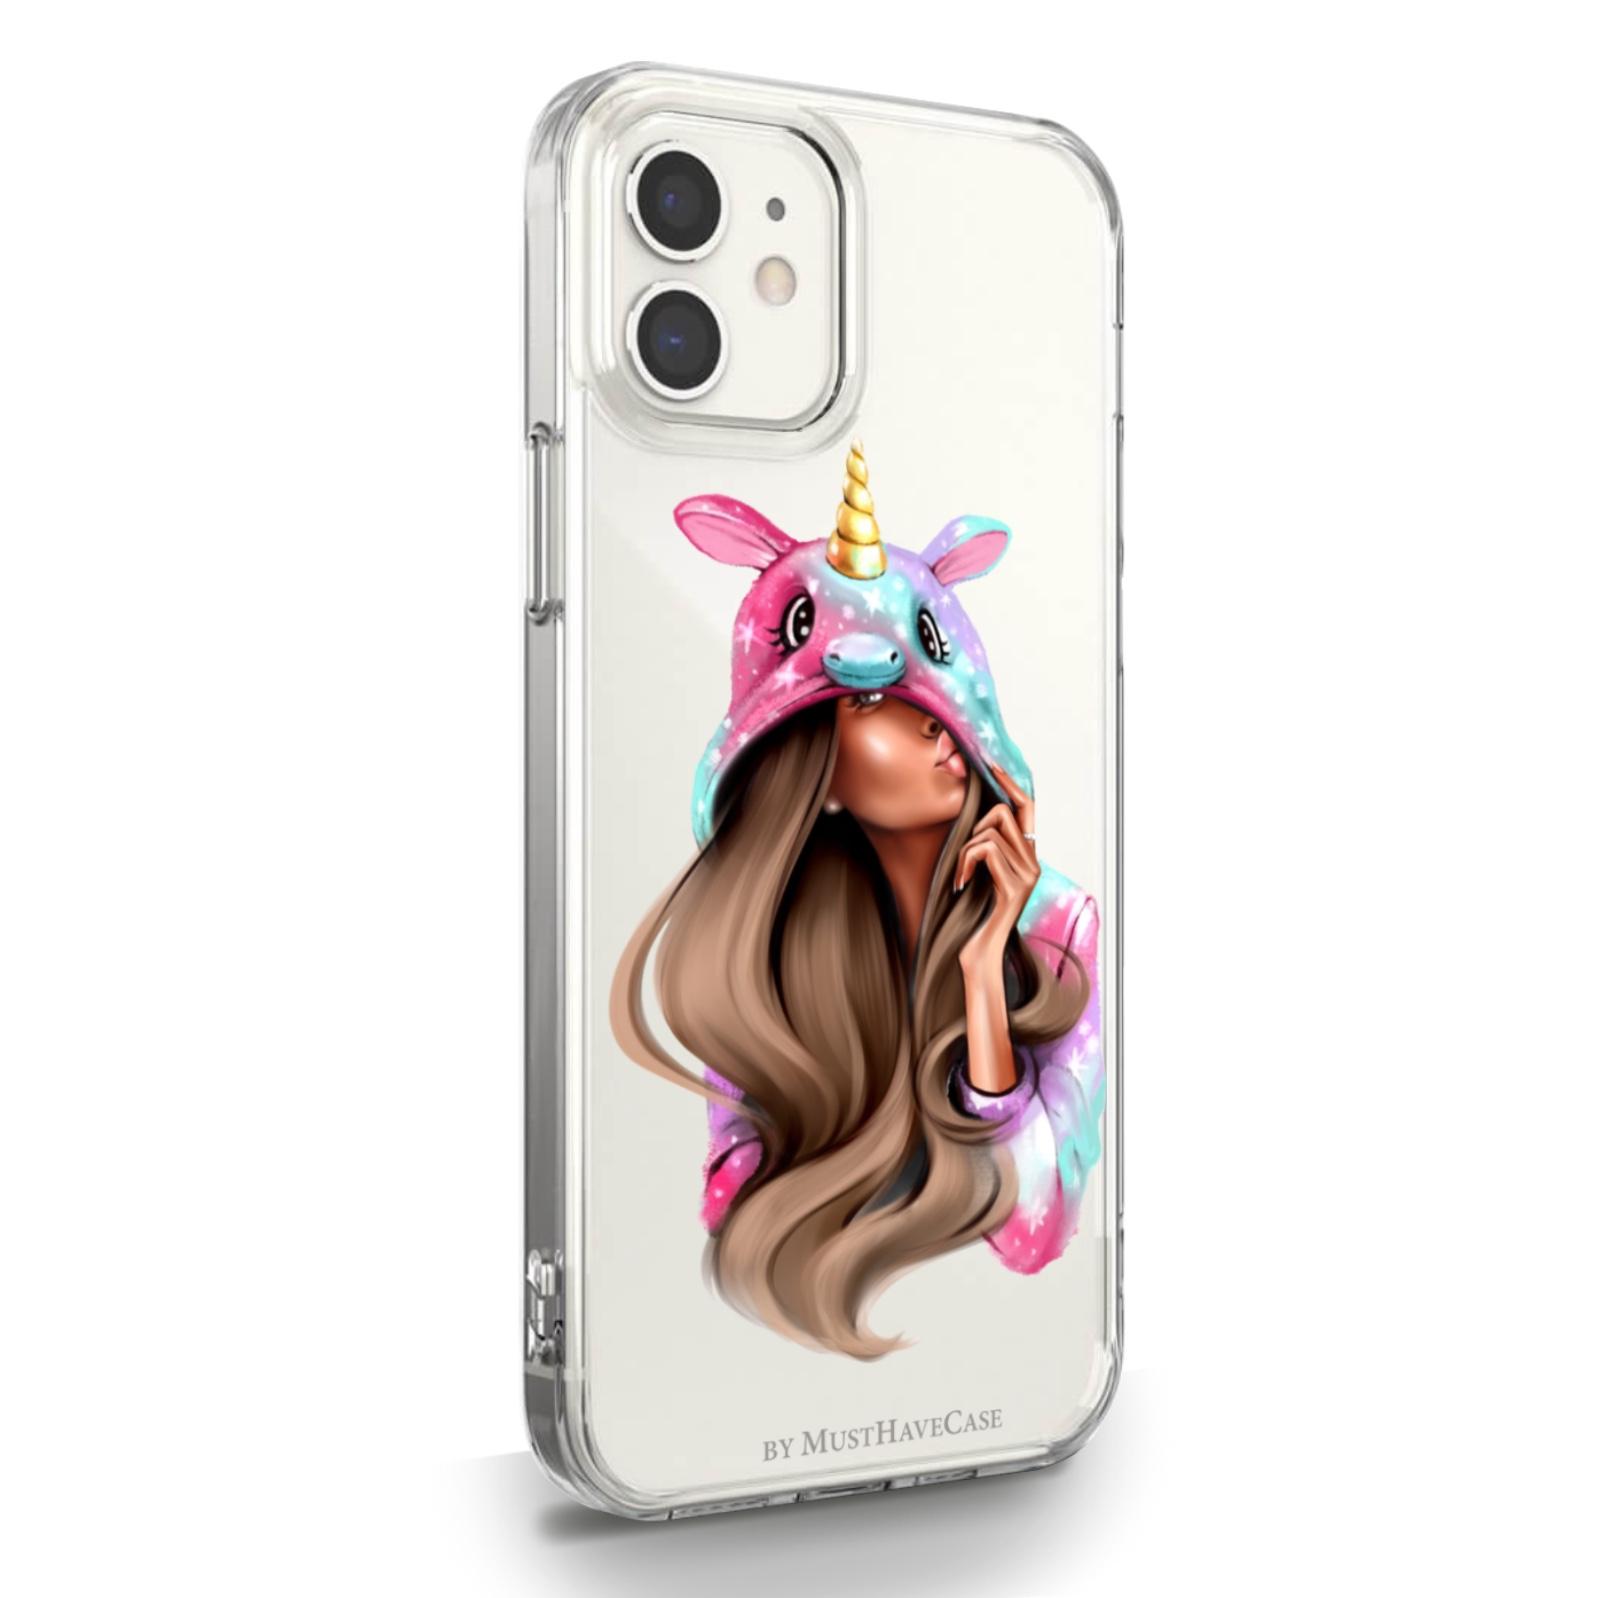 Прозрачный силиконовый чехол для iPhone 12 Mini Unicorn Girl/ Единорог для Айфон 12 Мини